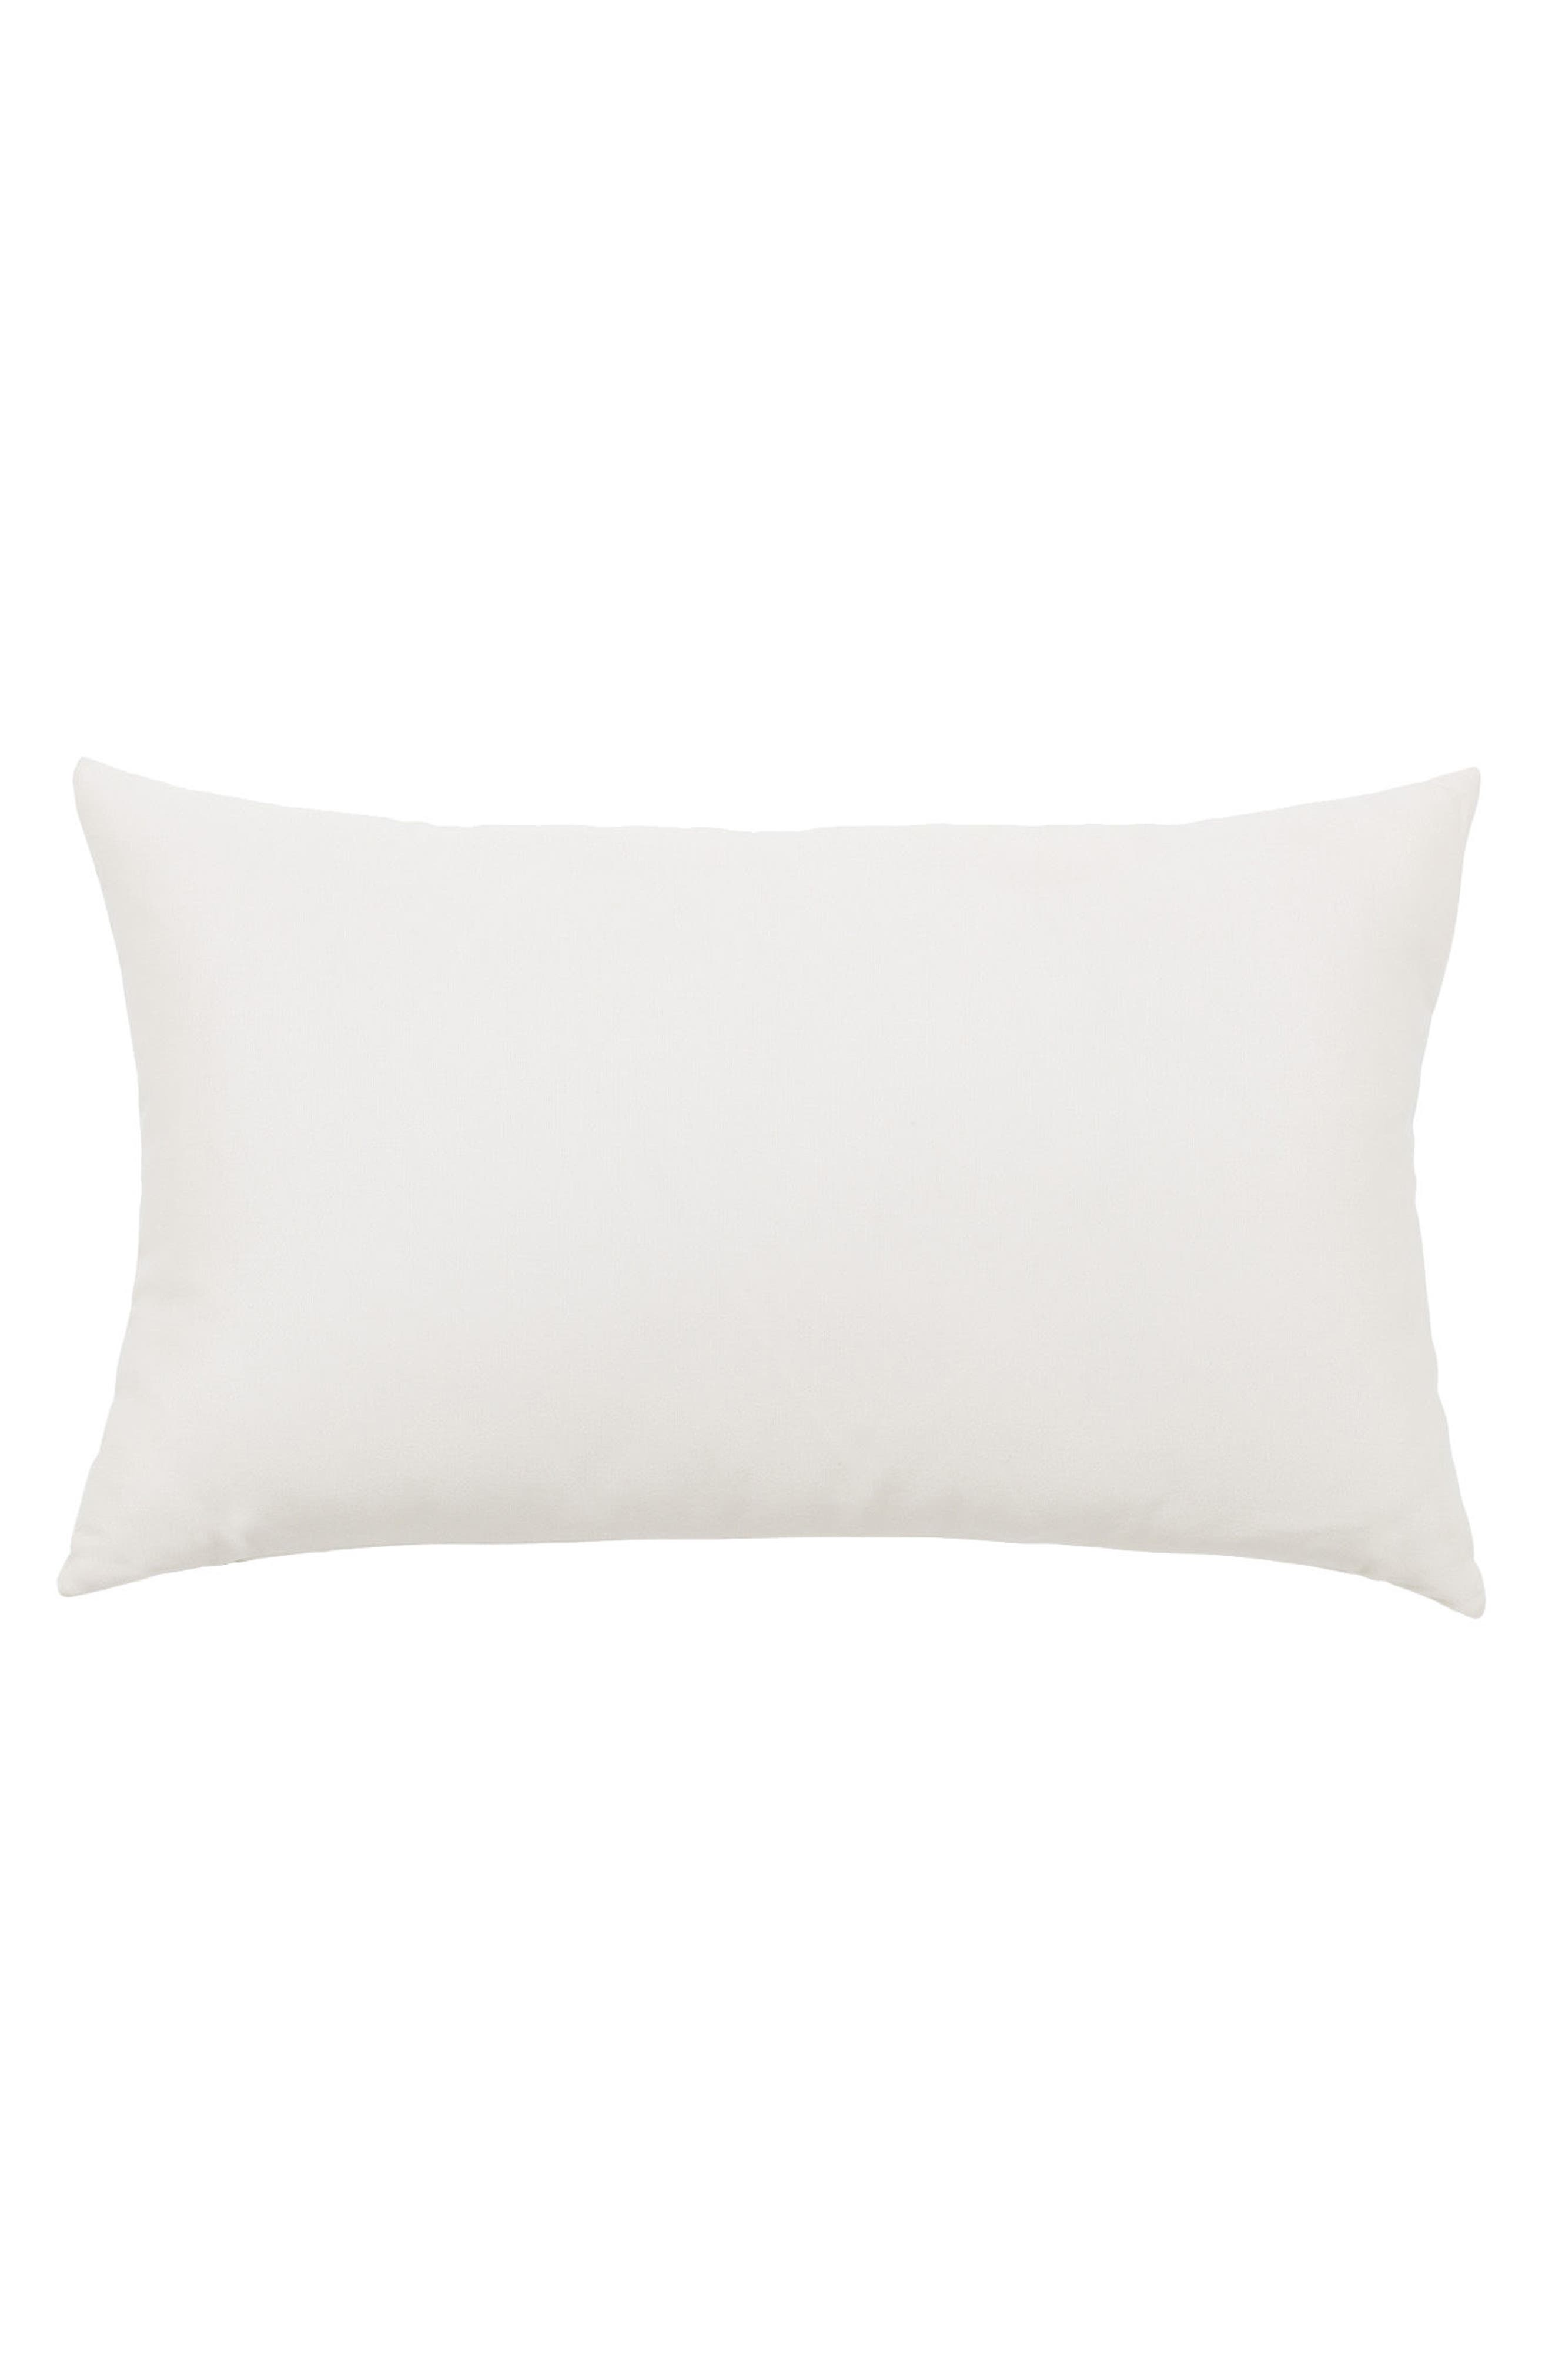 Oceana Deep Sea Lumbar Pillow,                             Alternate thumbnail 2, color,                             400